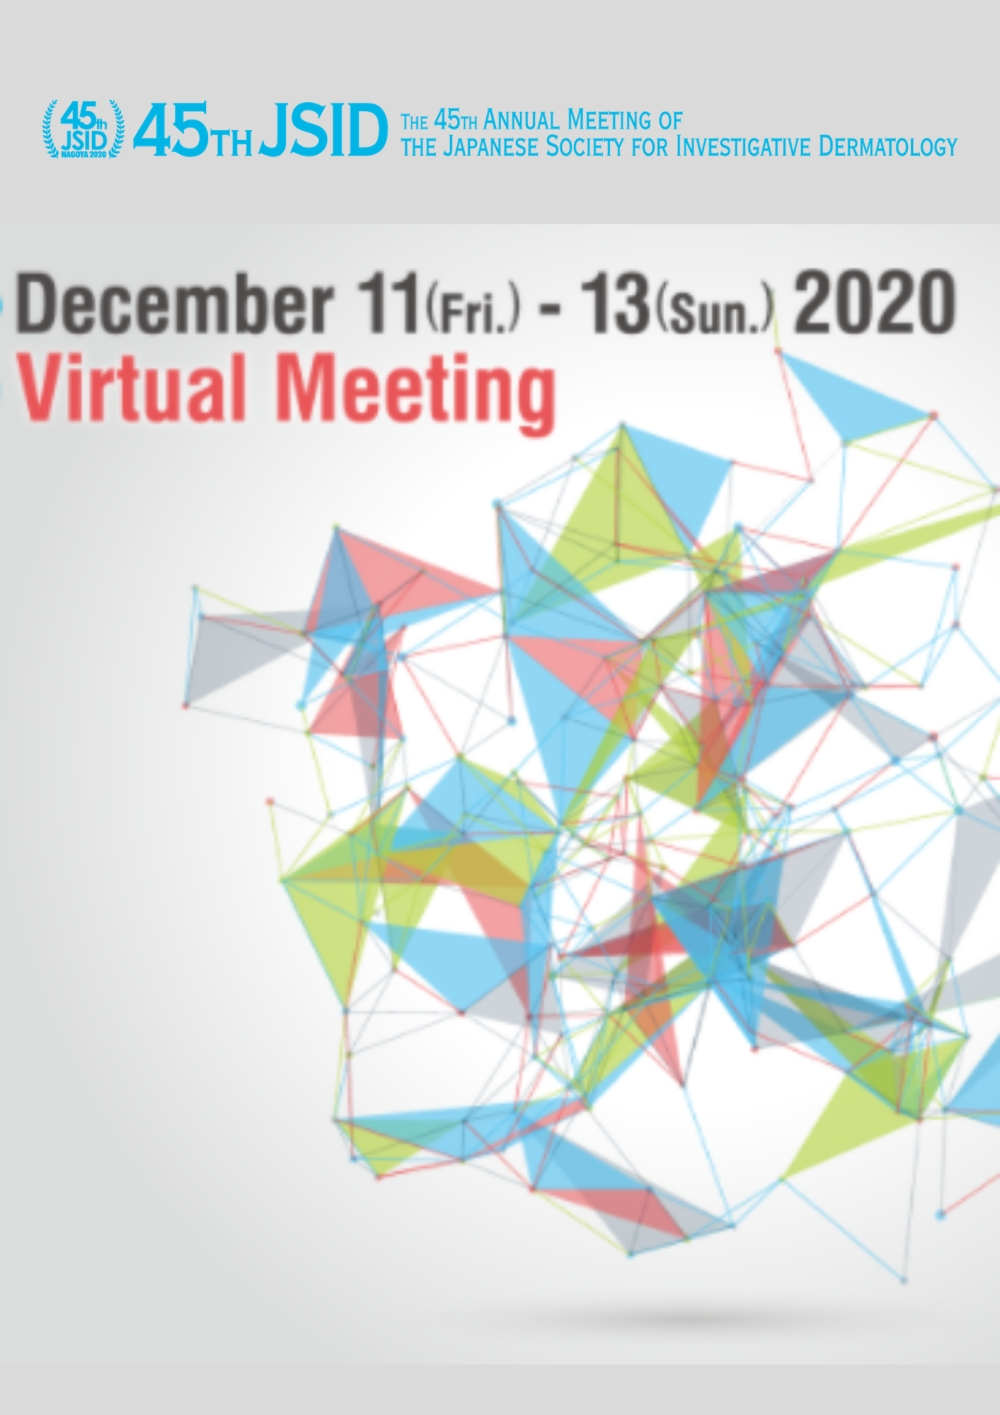 JSID 45th Annual Meeting